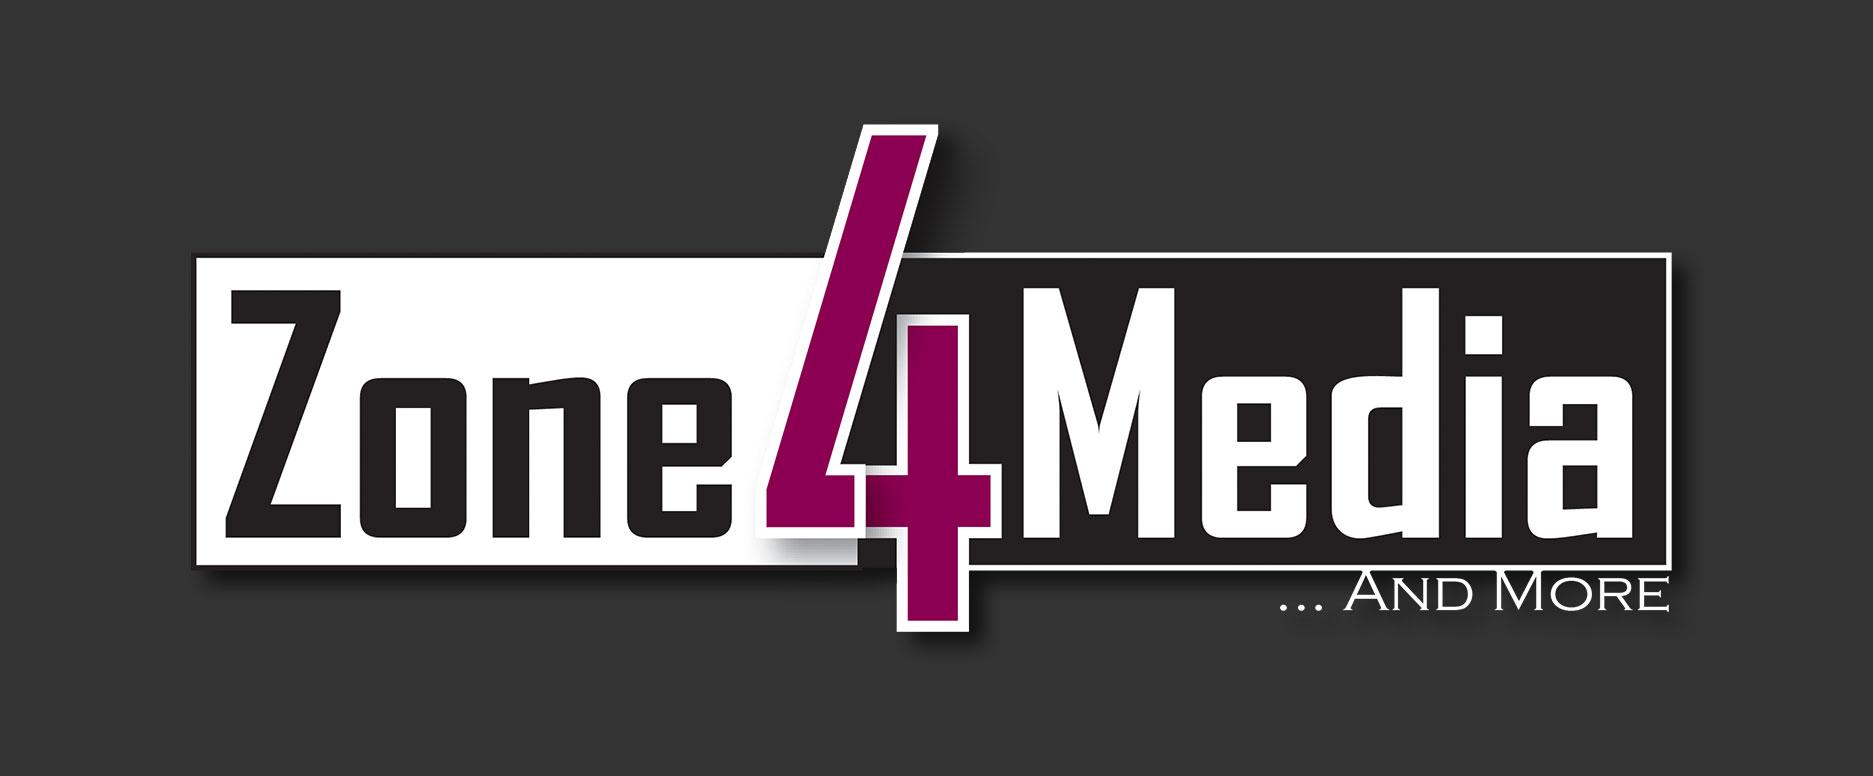 Despre Zone4Media